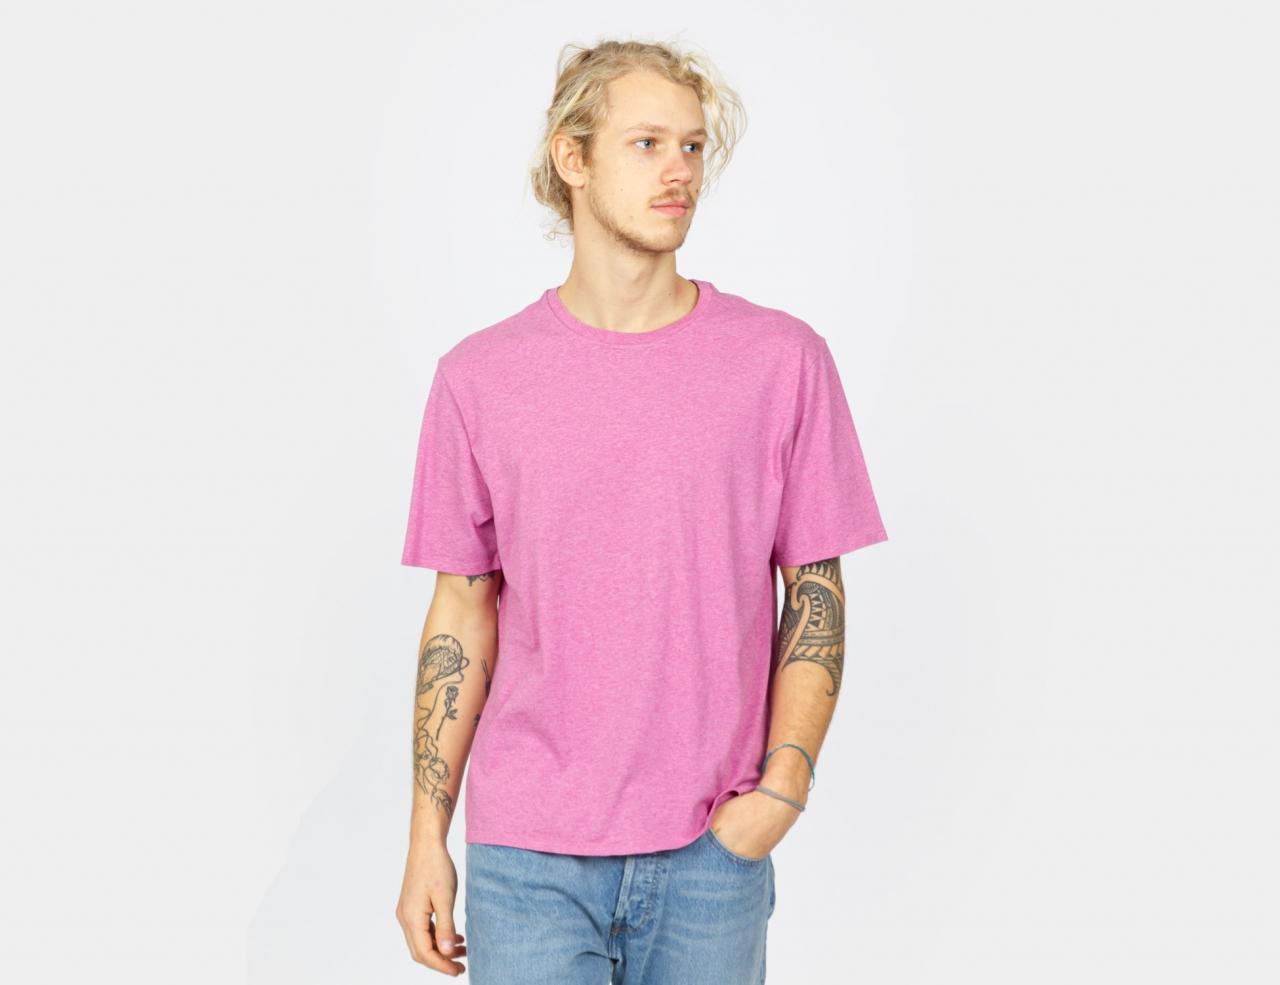 Patagonia Road To Regenerative Lightweight Shirt - Marble Pink